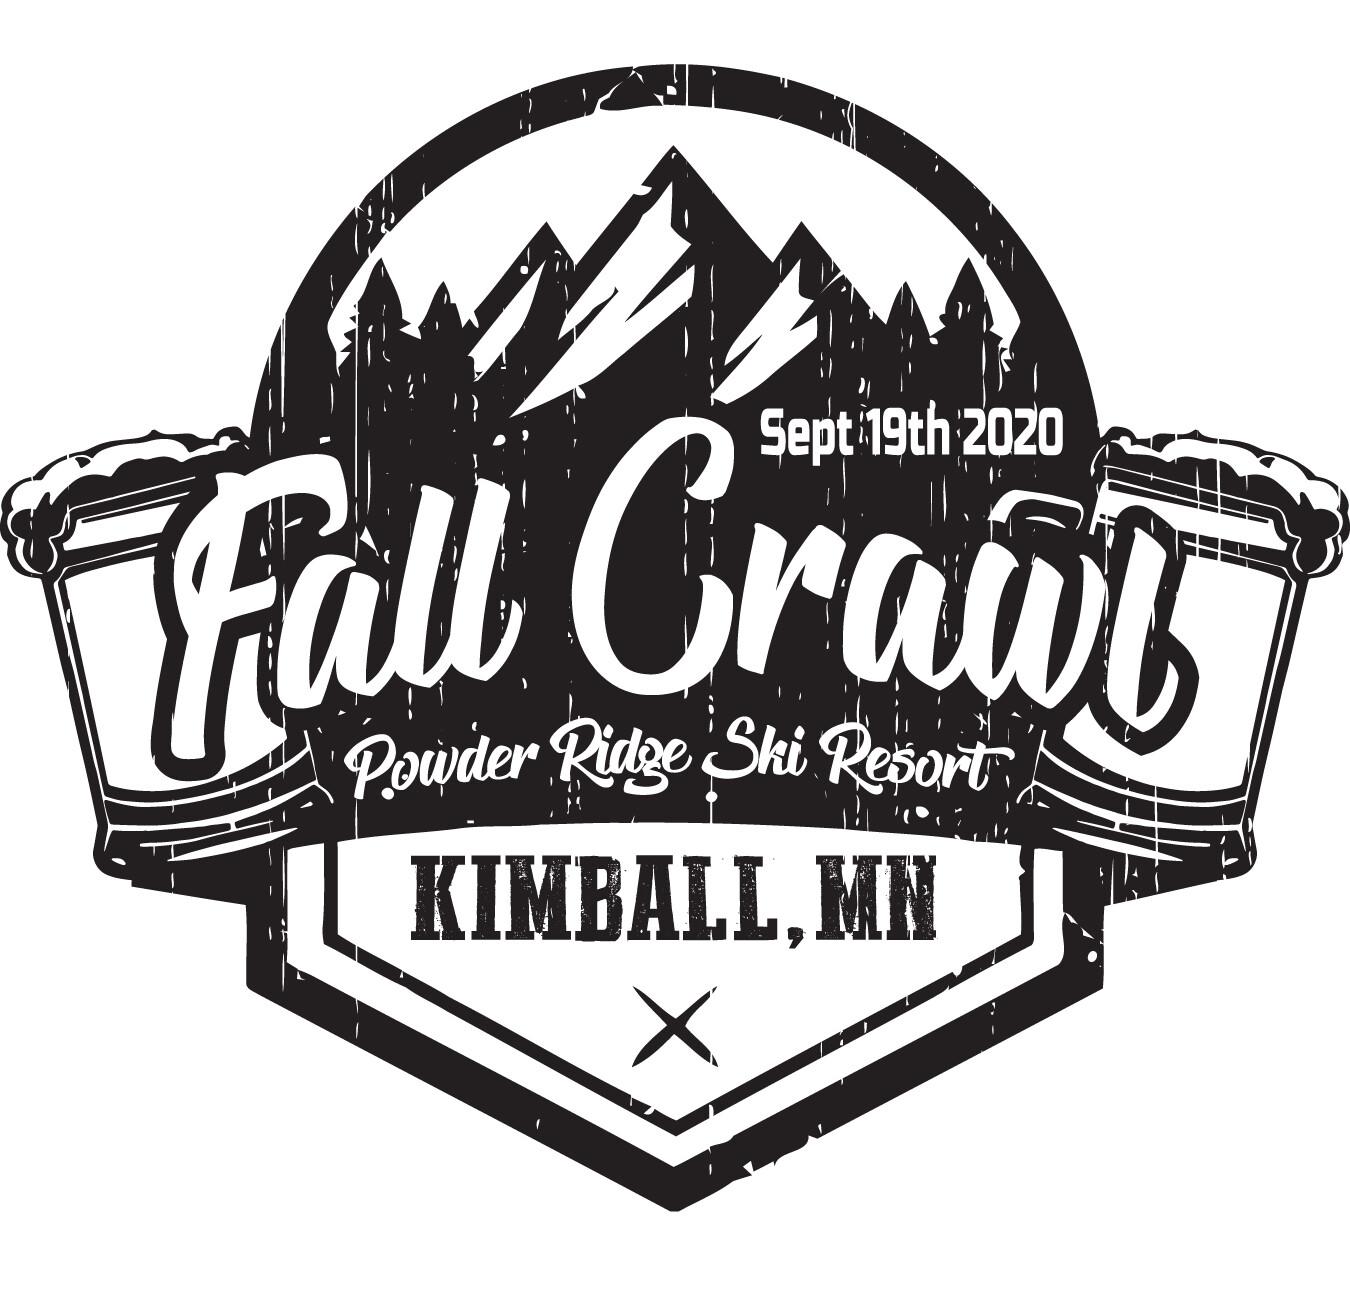 Fall Crawl - General Admission